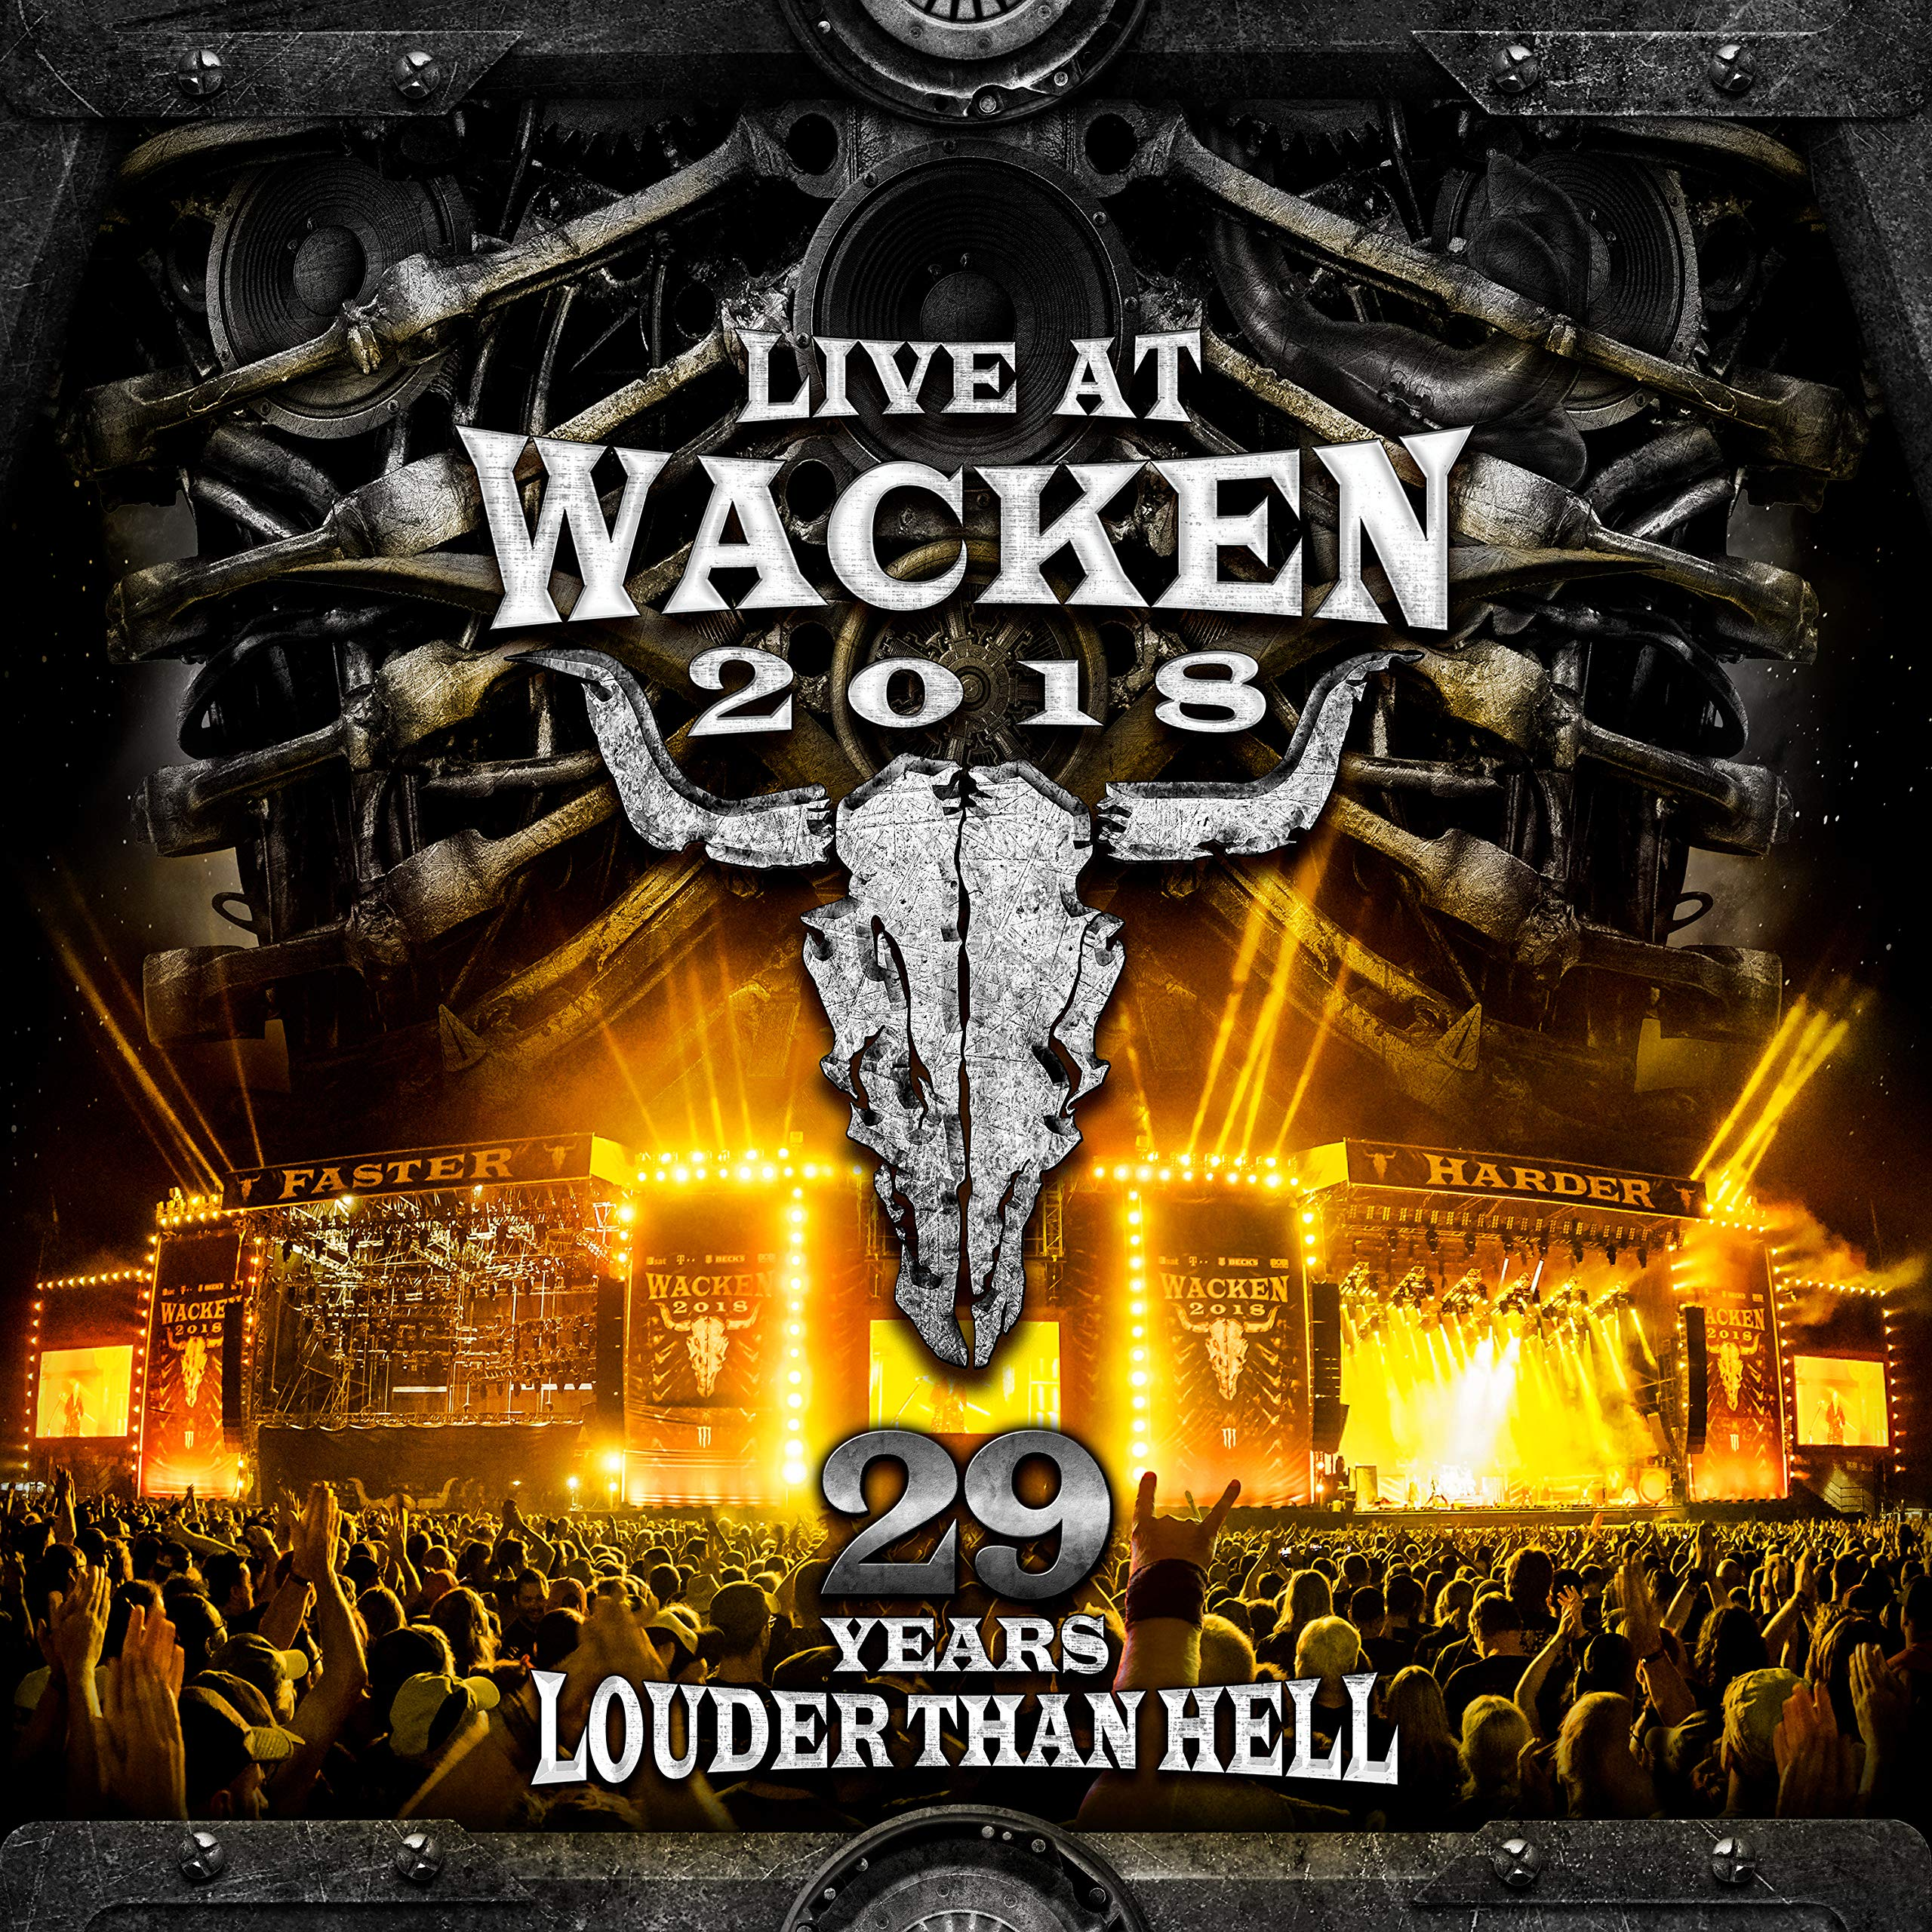 VA – Live At Wacken 2018 29 Years Louder Than Hell (2019) [FLAC]